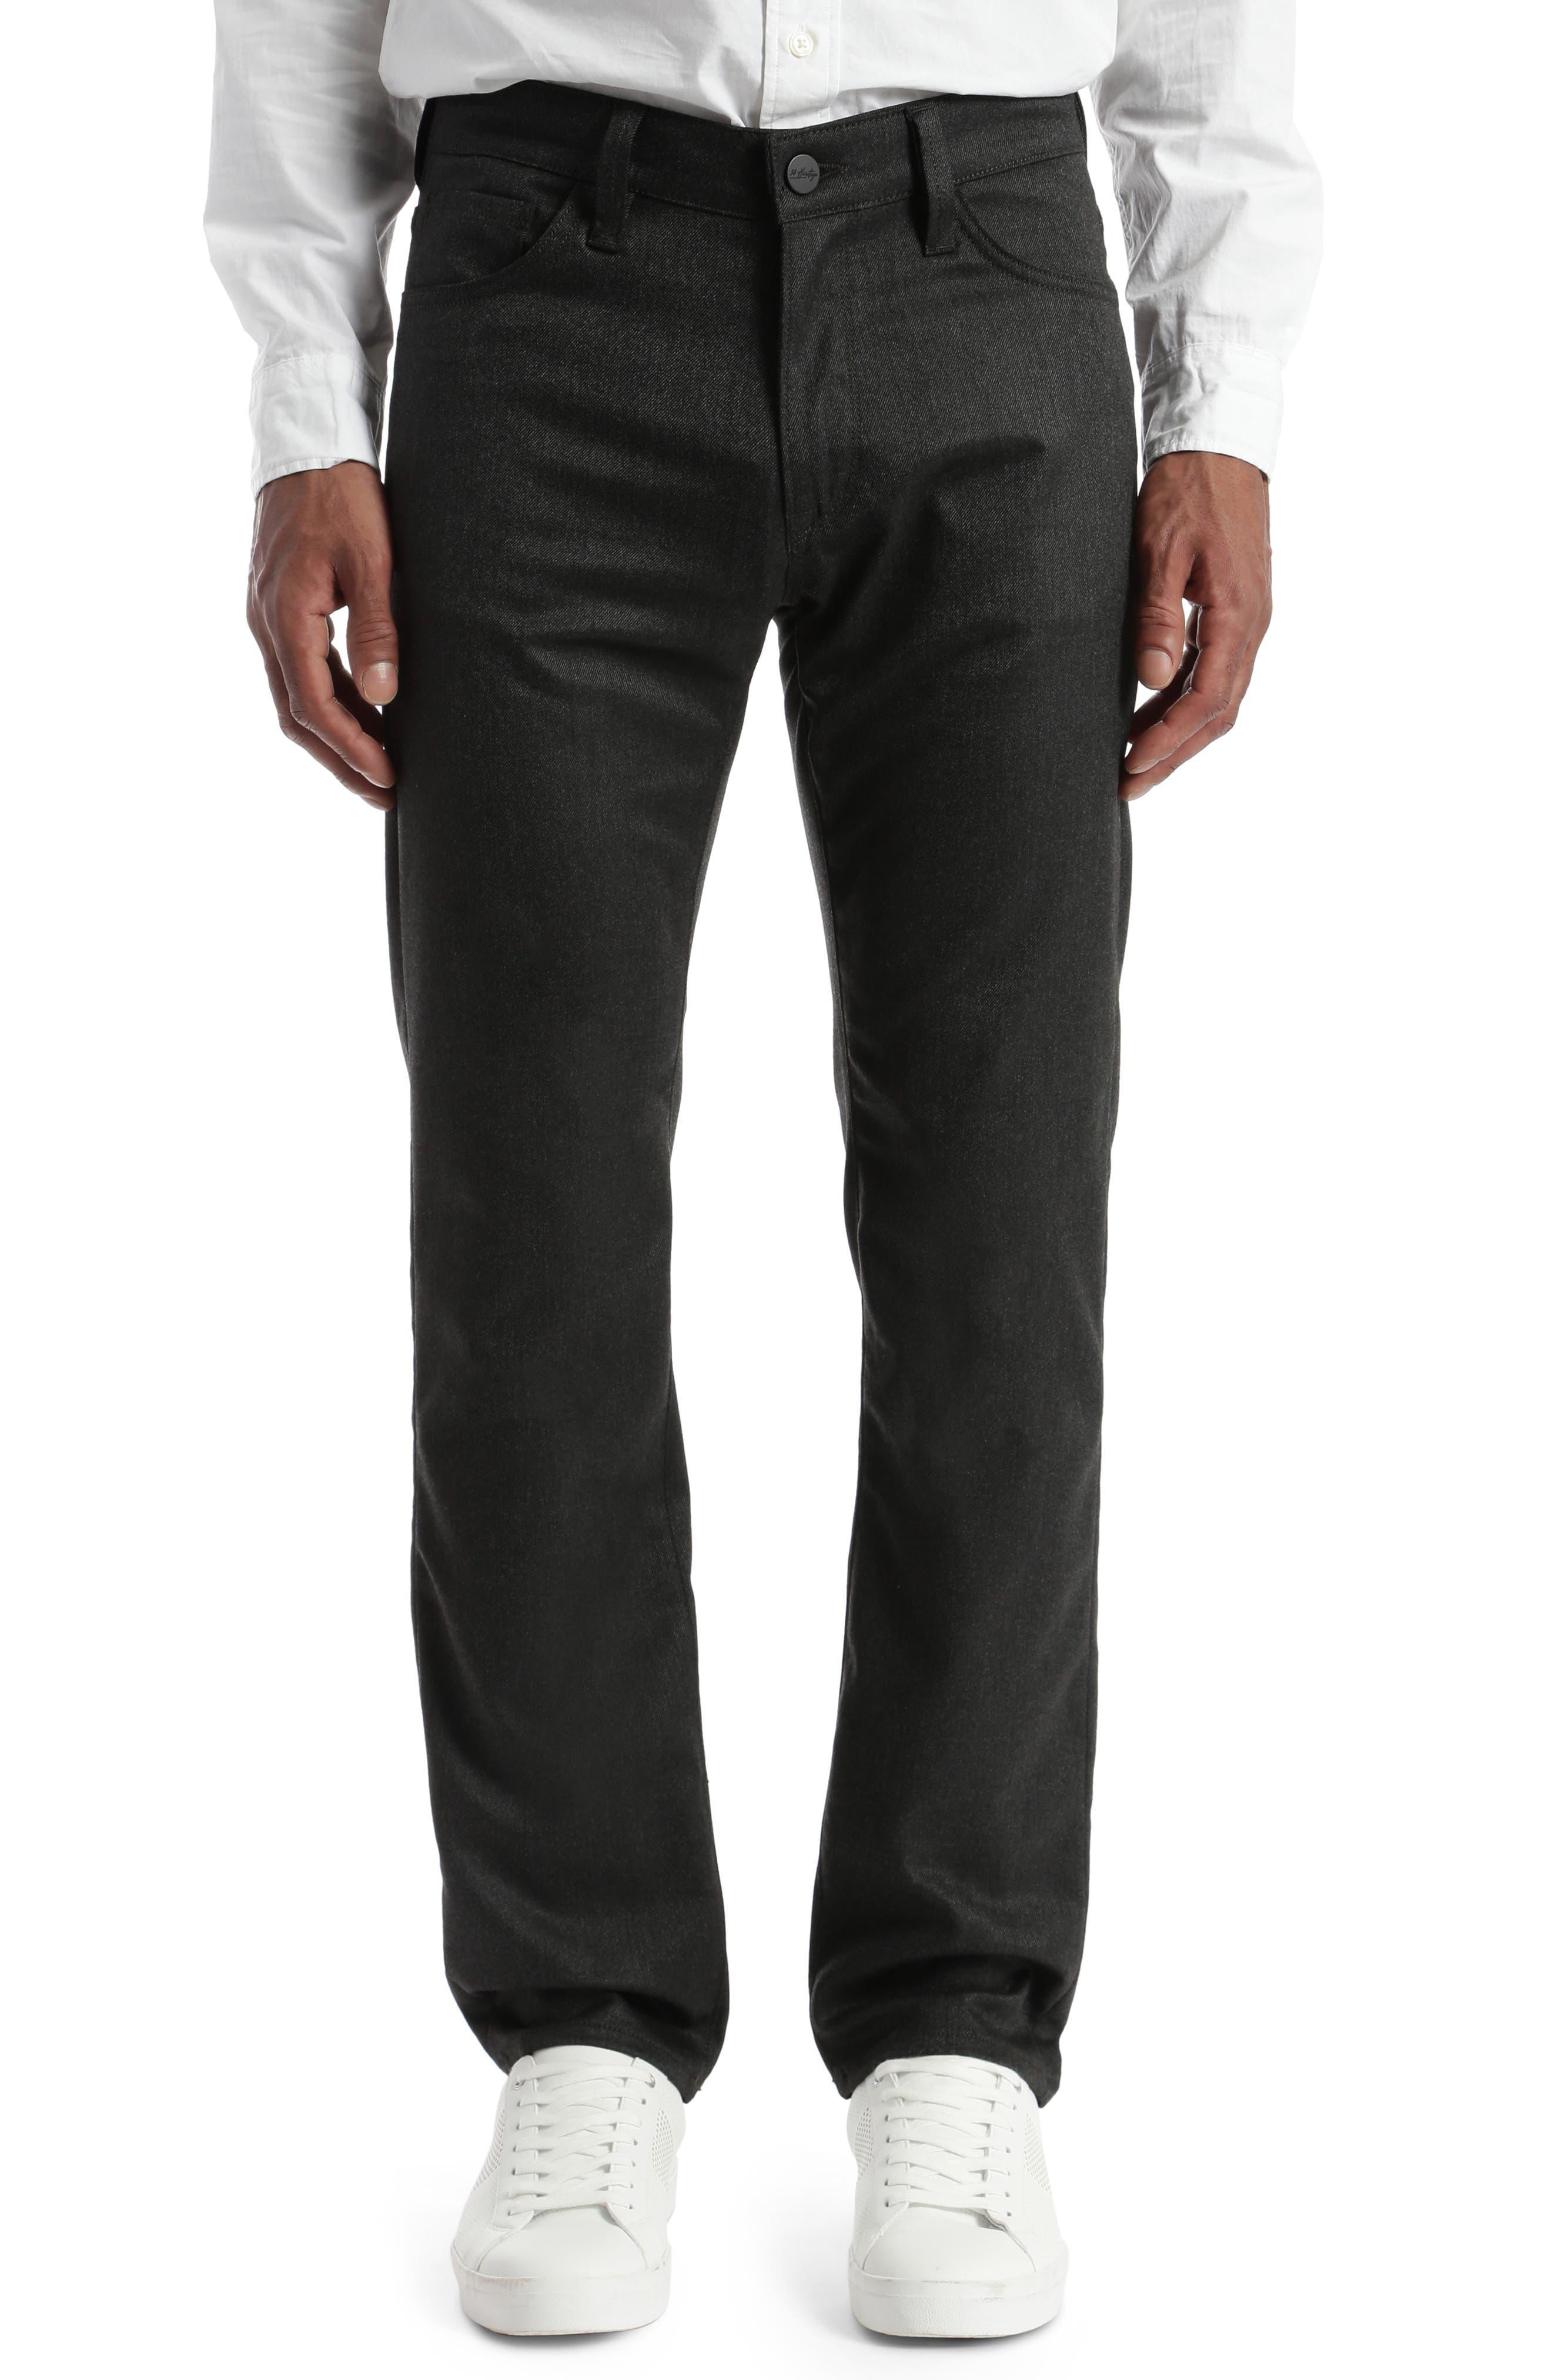 Image of 34 Heritage 34 Courage Supreme Slim Straight Jeans